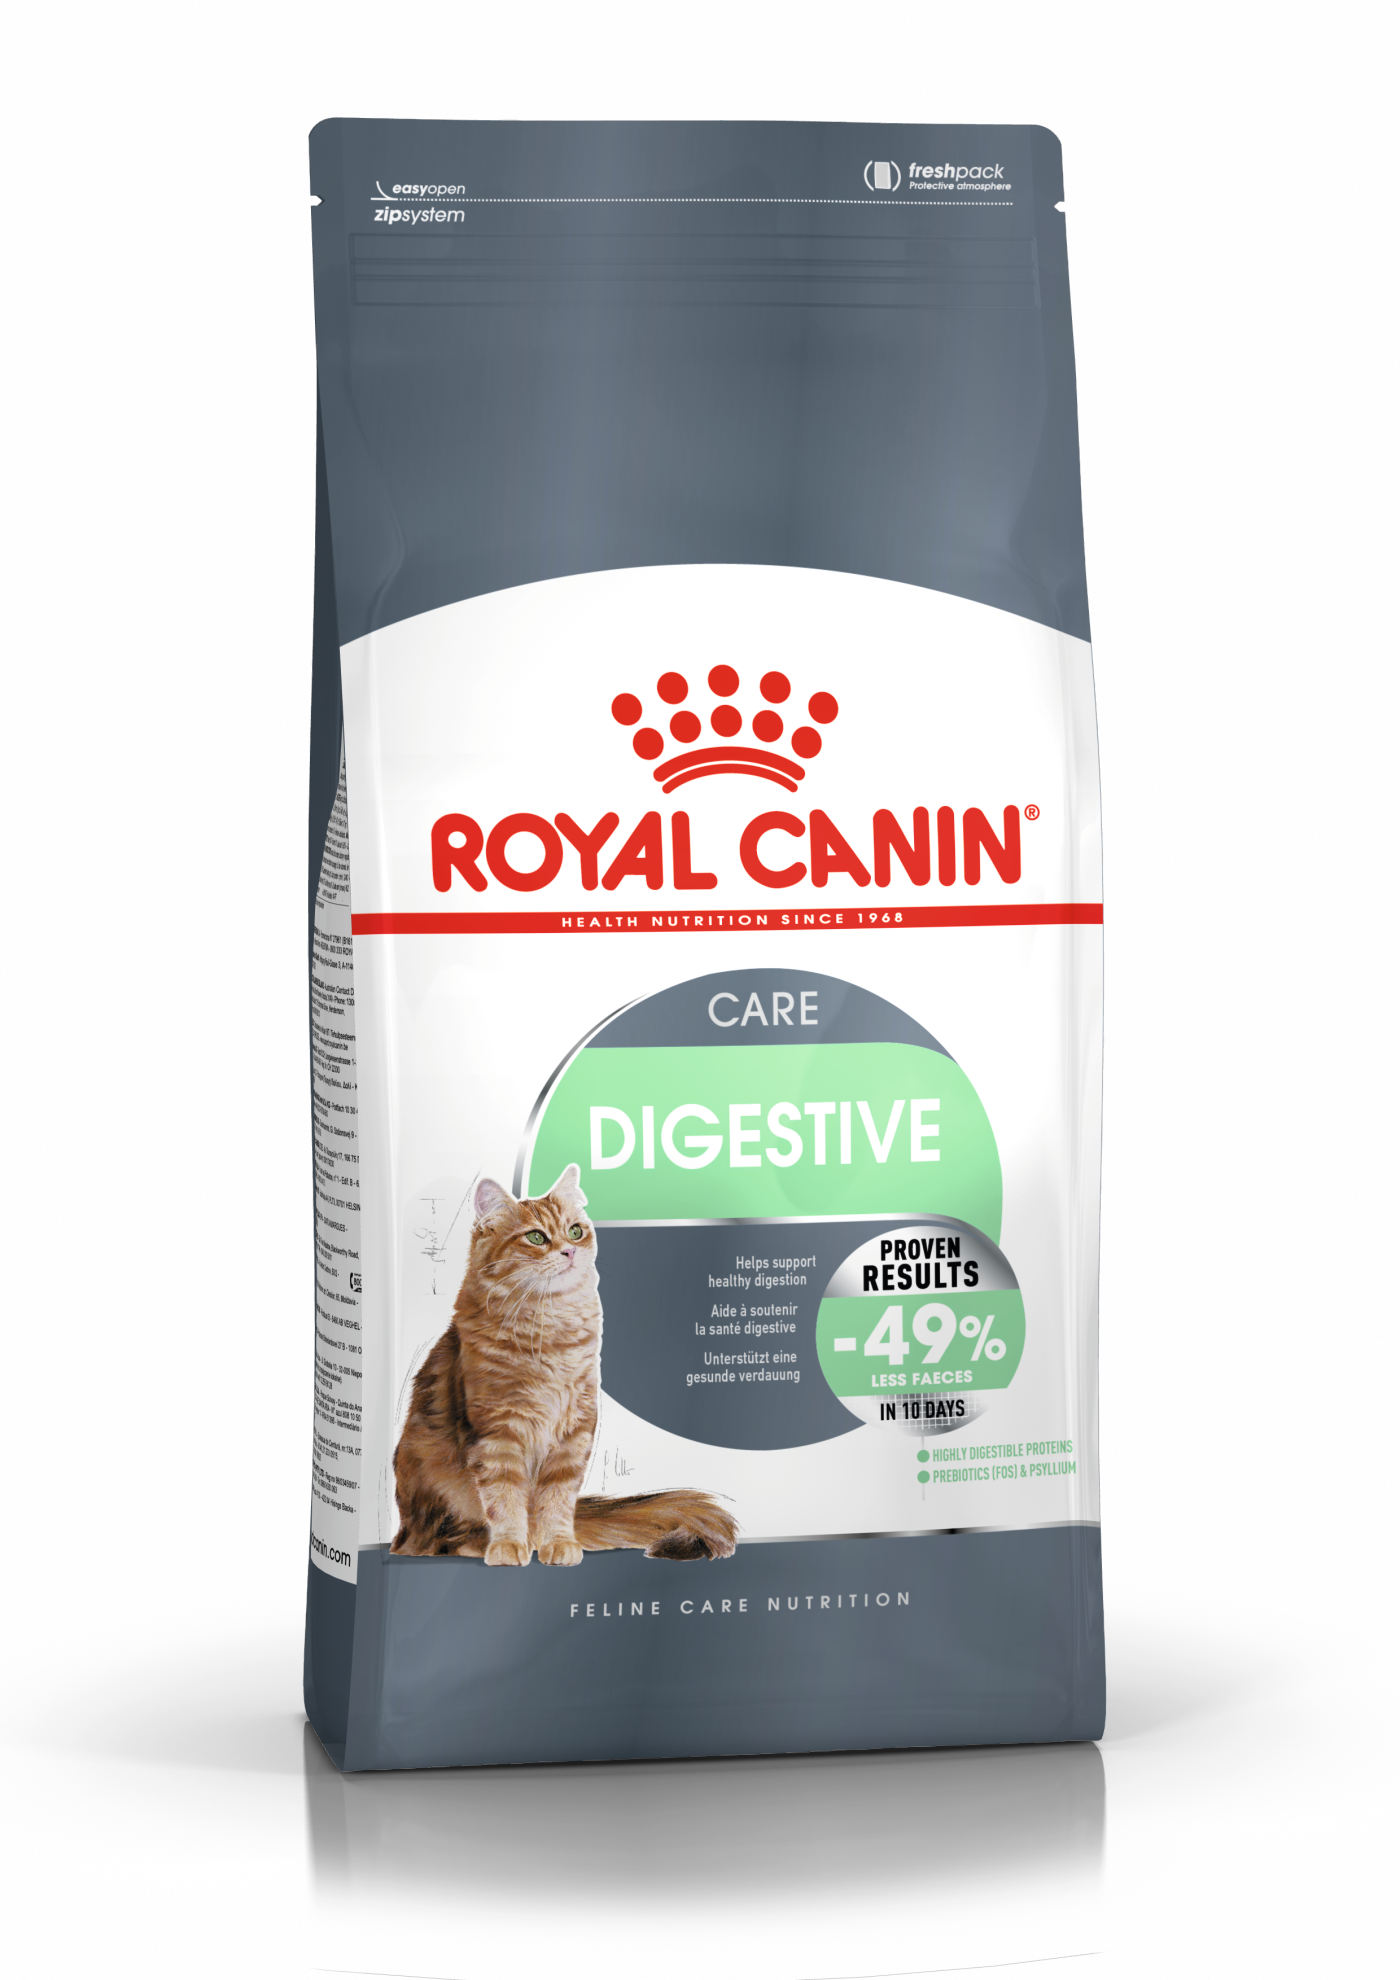 Digestive Care, 400g